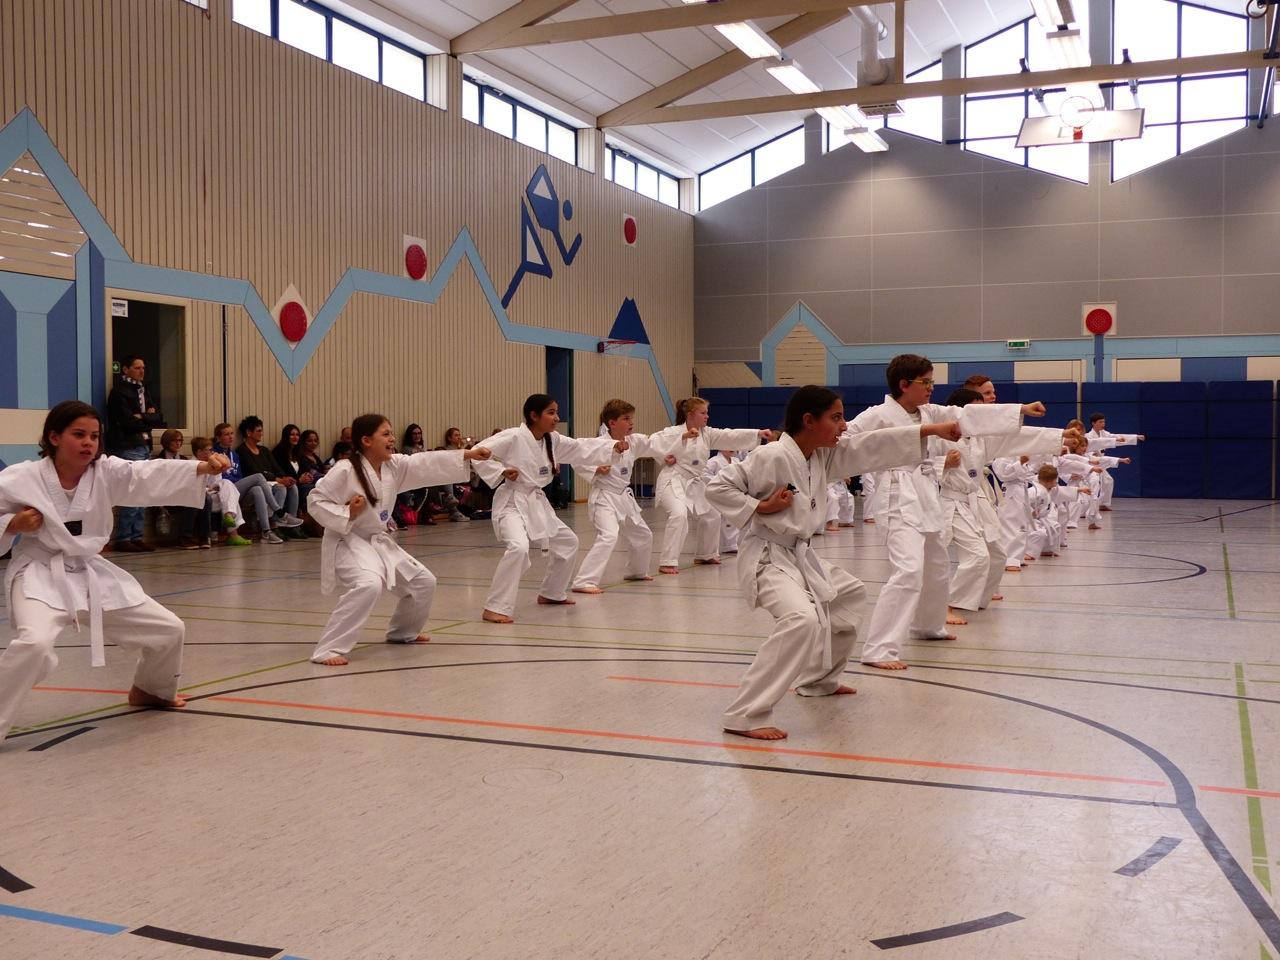 Taekwondo Eine Koreanische Sportart An Der Taunusschule